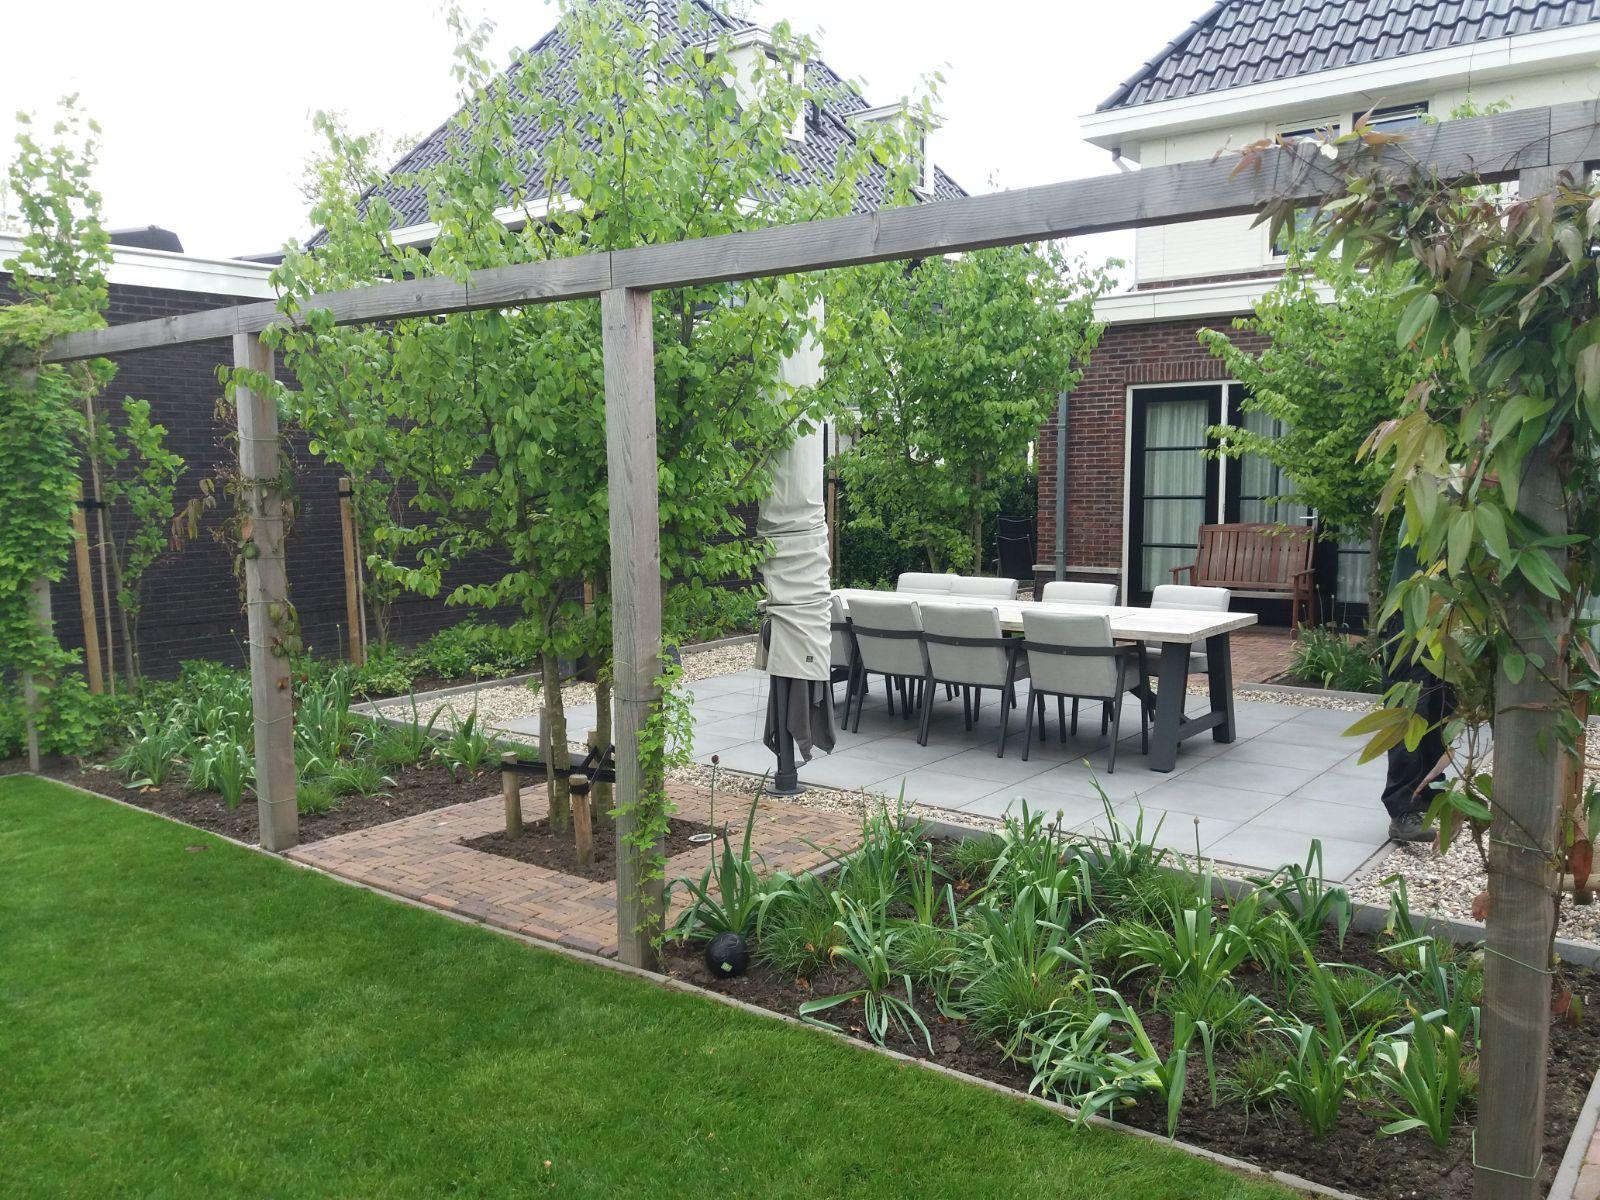 Update landelijke en strakke tuin in houten oscar s groen